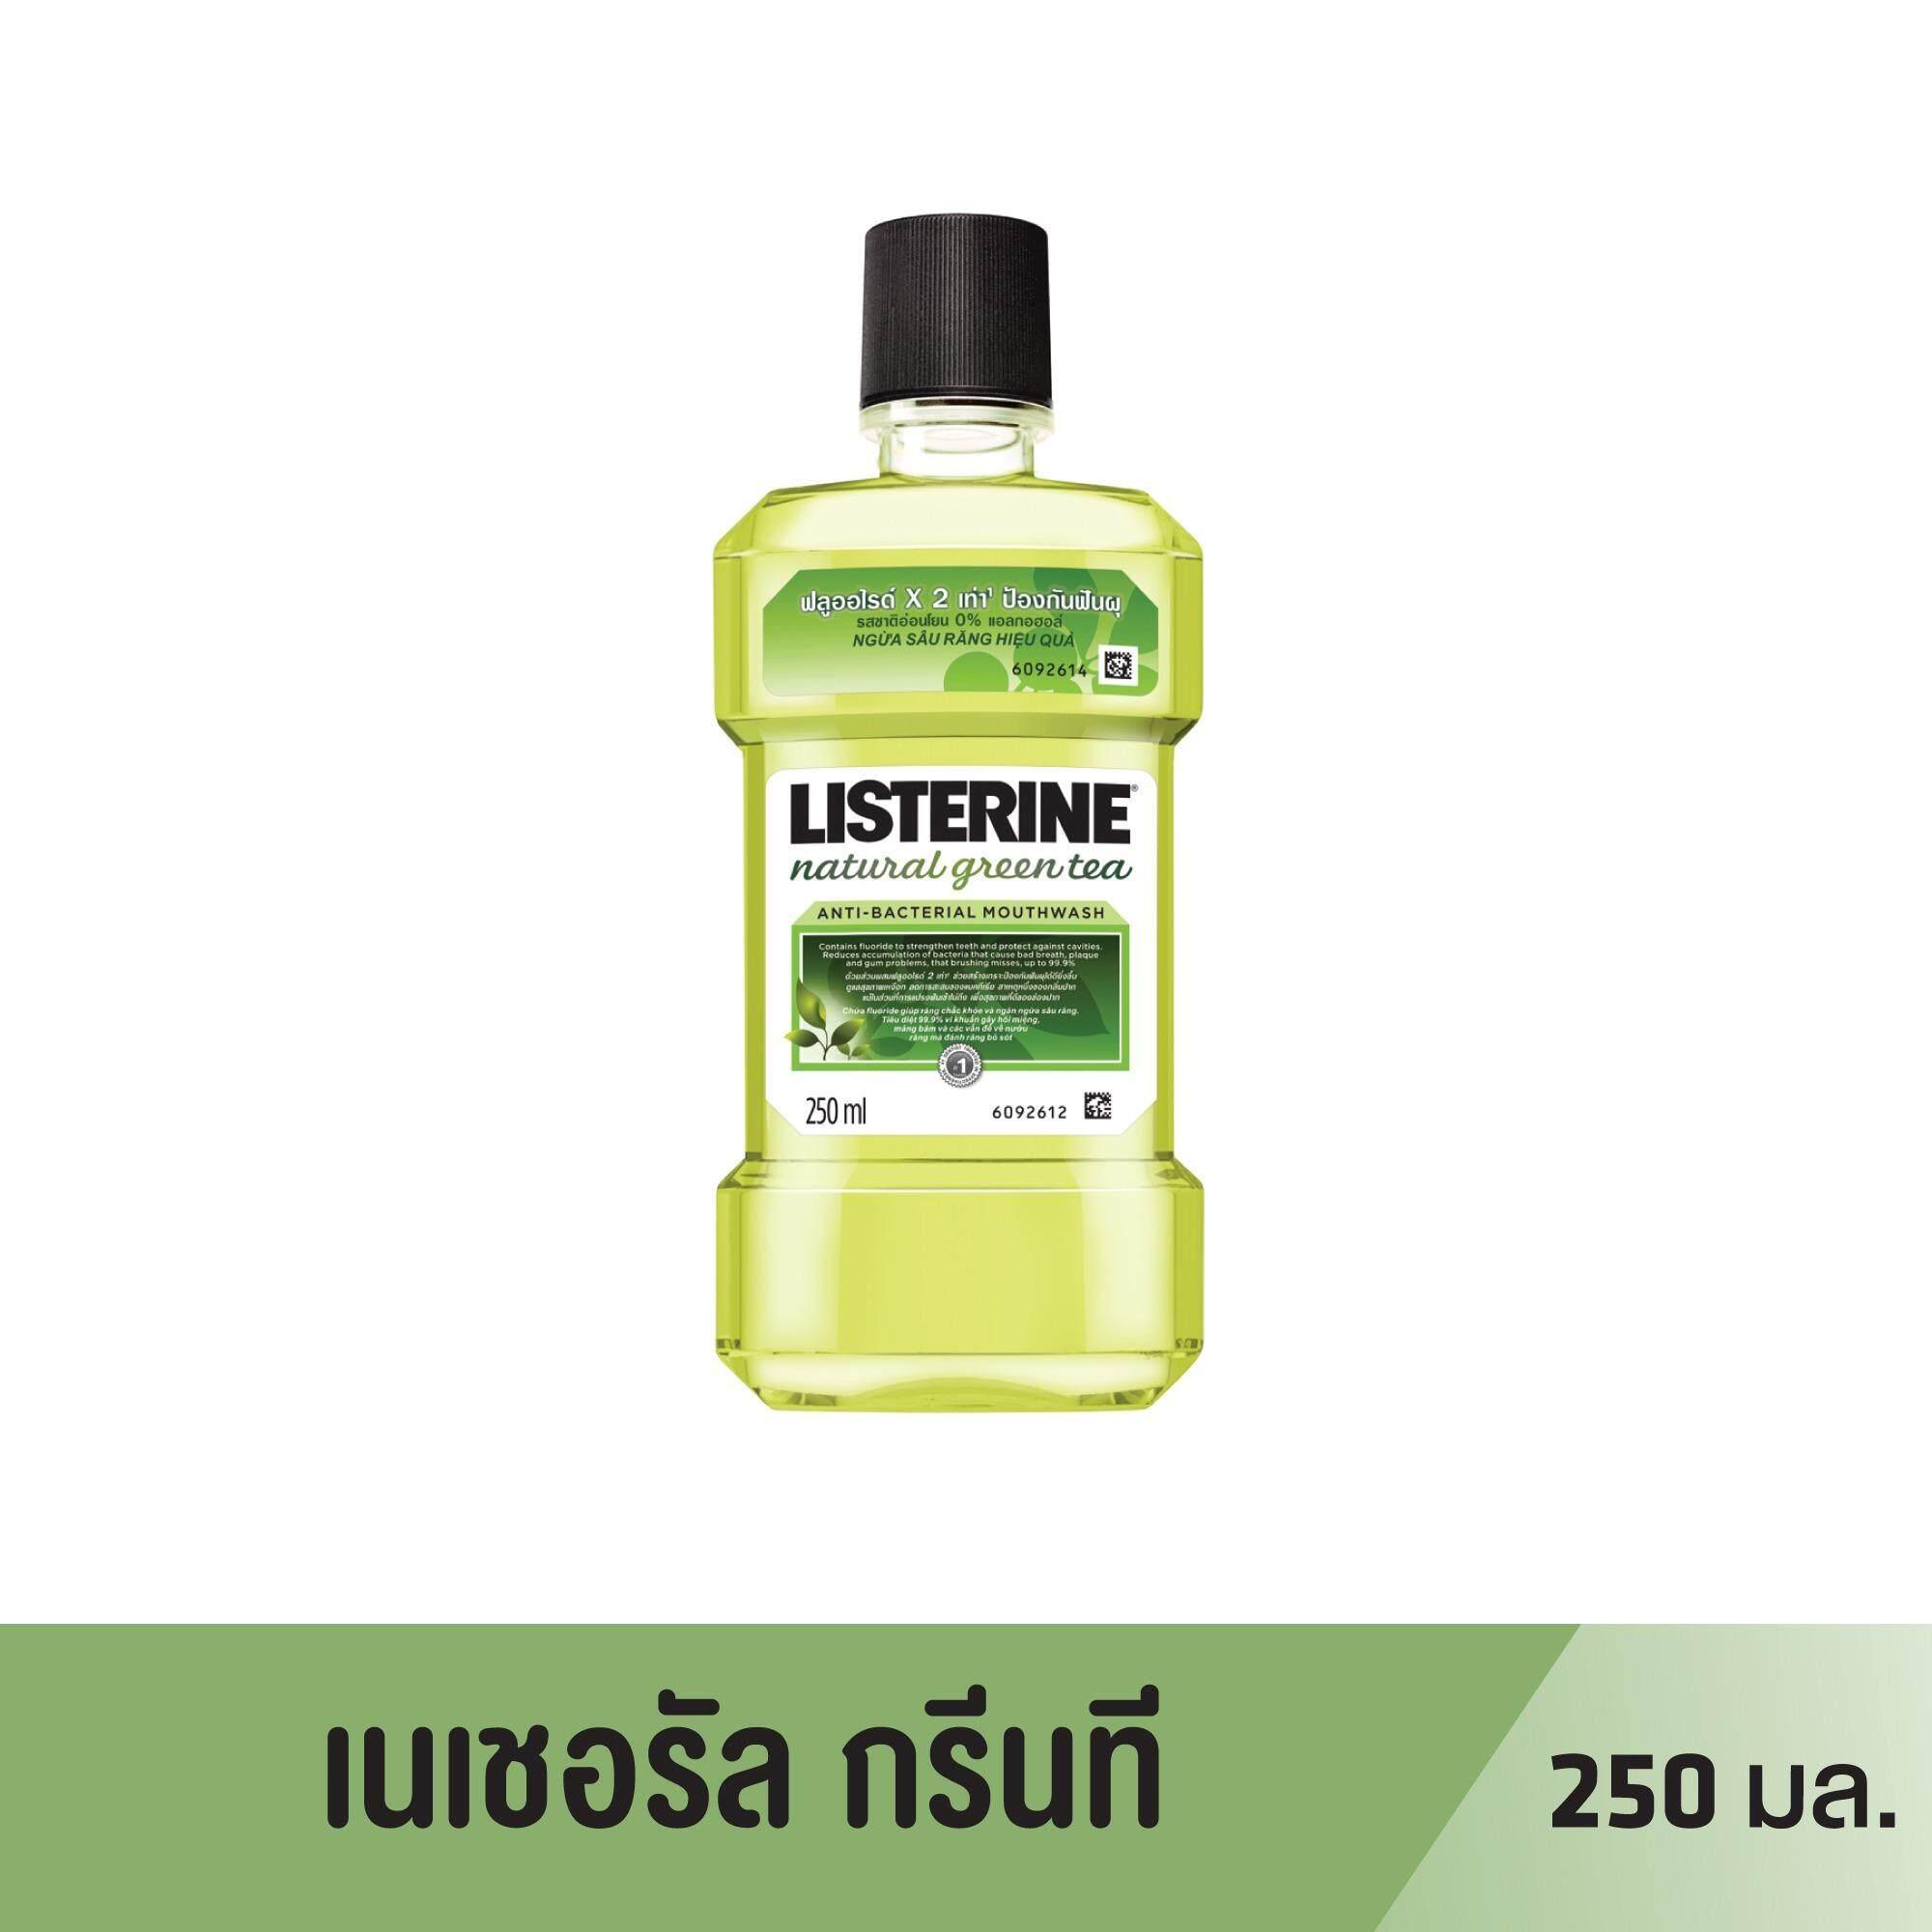 Listerine น้ำยาบ้วนปาก ลิสเตอรีน เนเชอรัล กรีนที 250ml